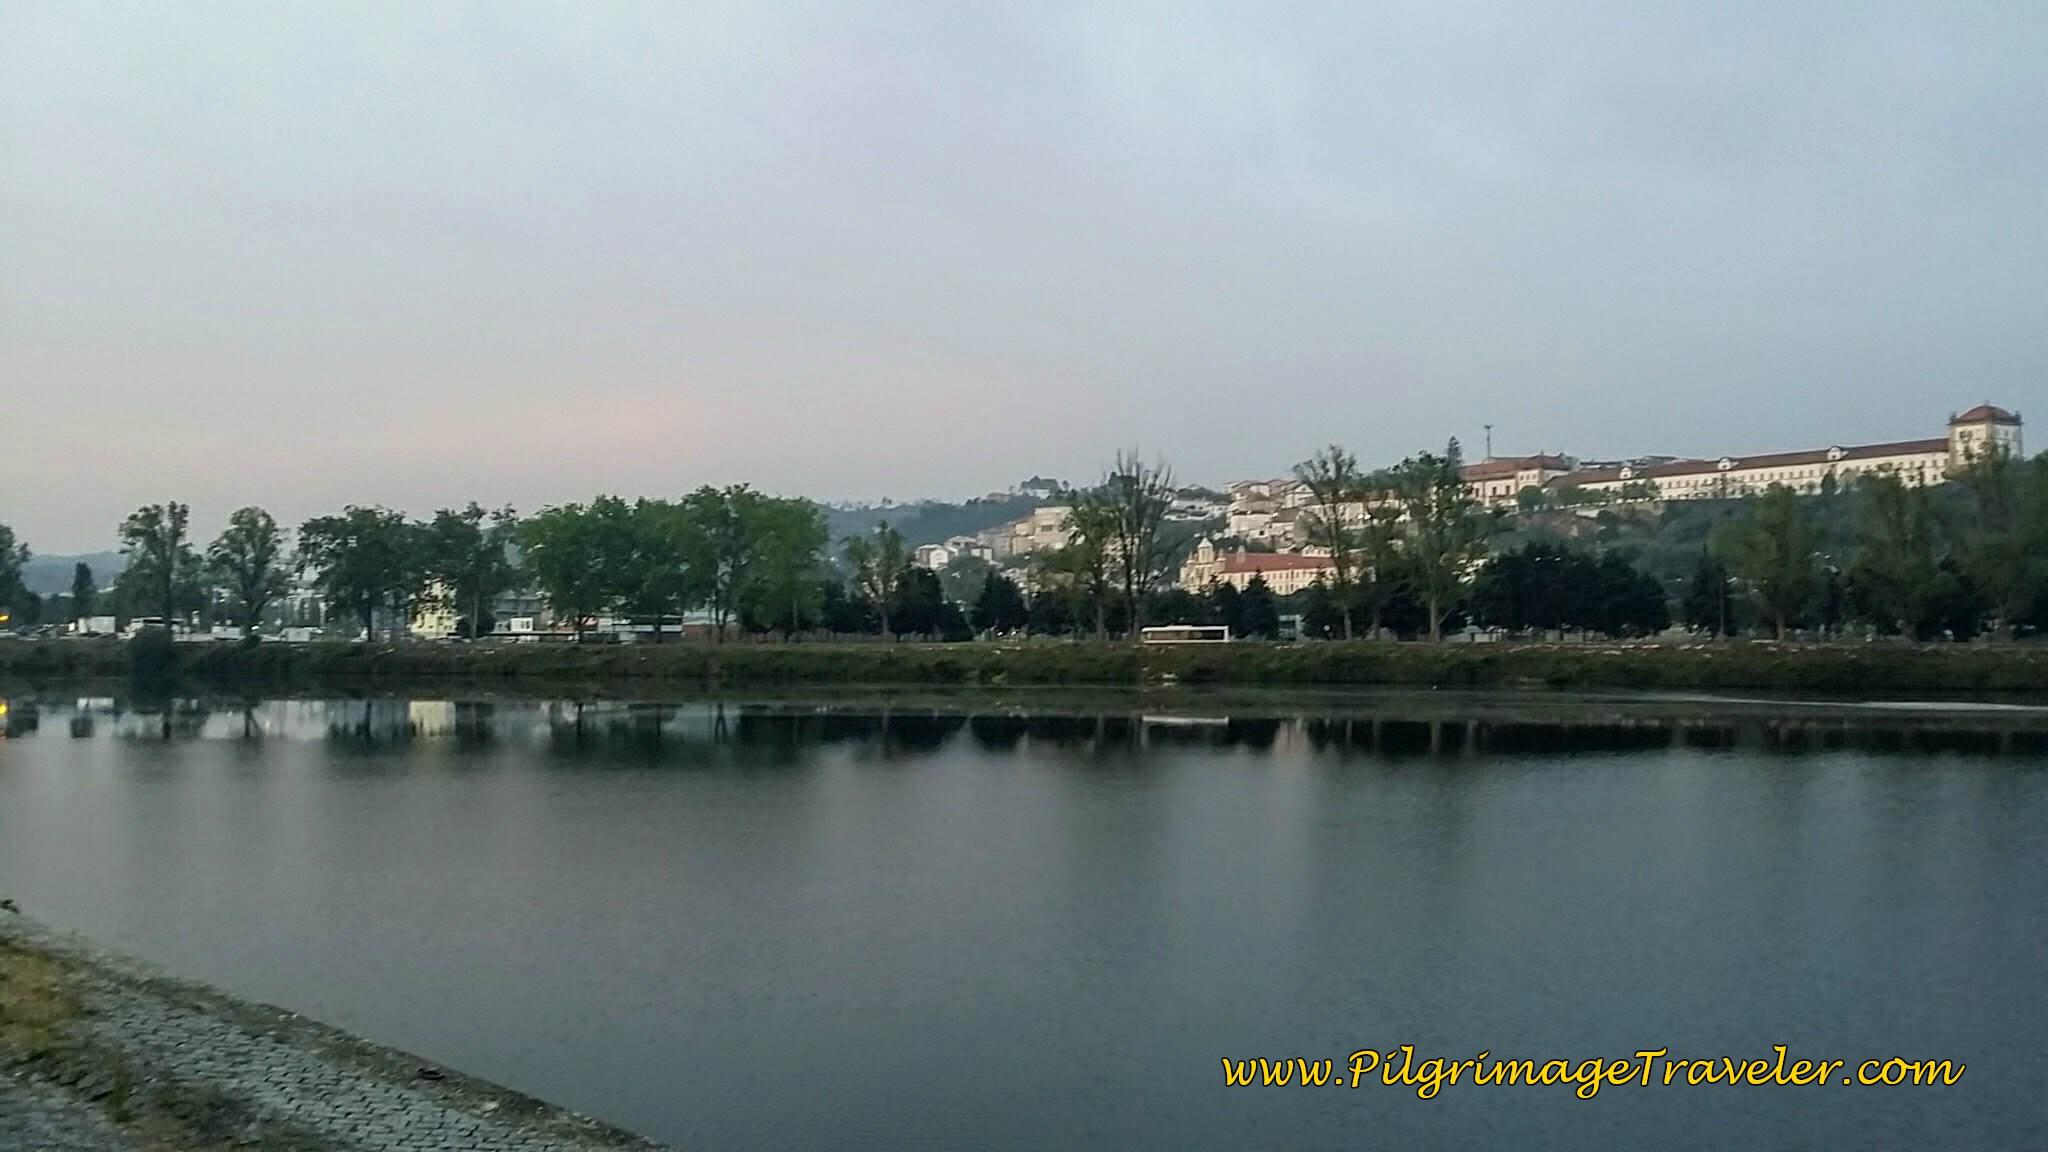 View Across the Rio Mondego, at dawn in Coimbra, Portugal